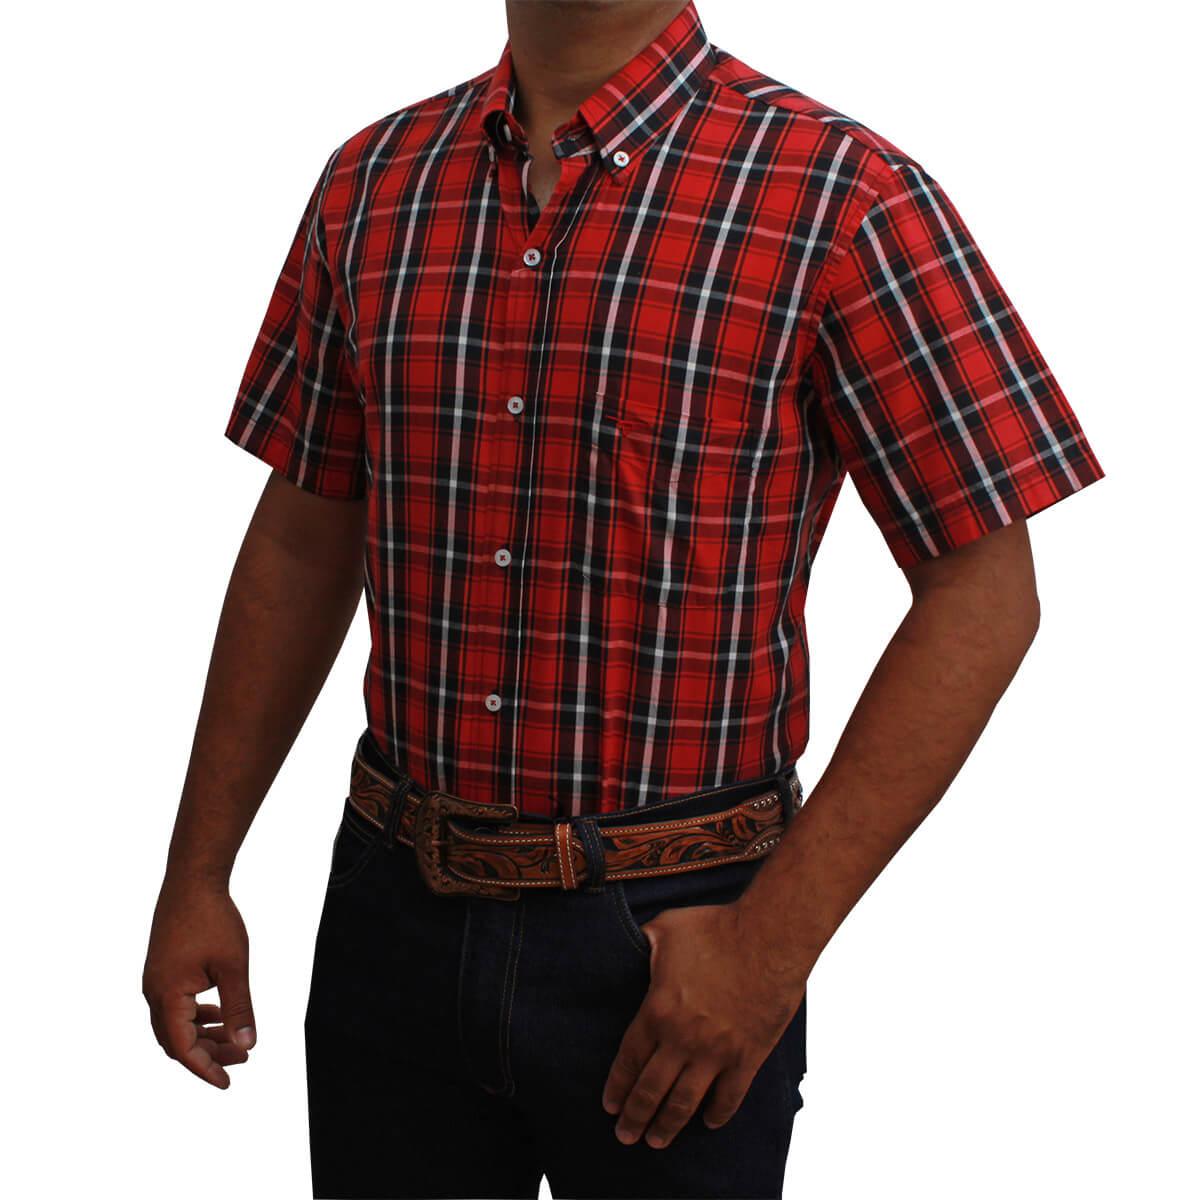 Camisa All Hunter Masculina Xadrez Vermelho E Preto